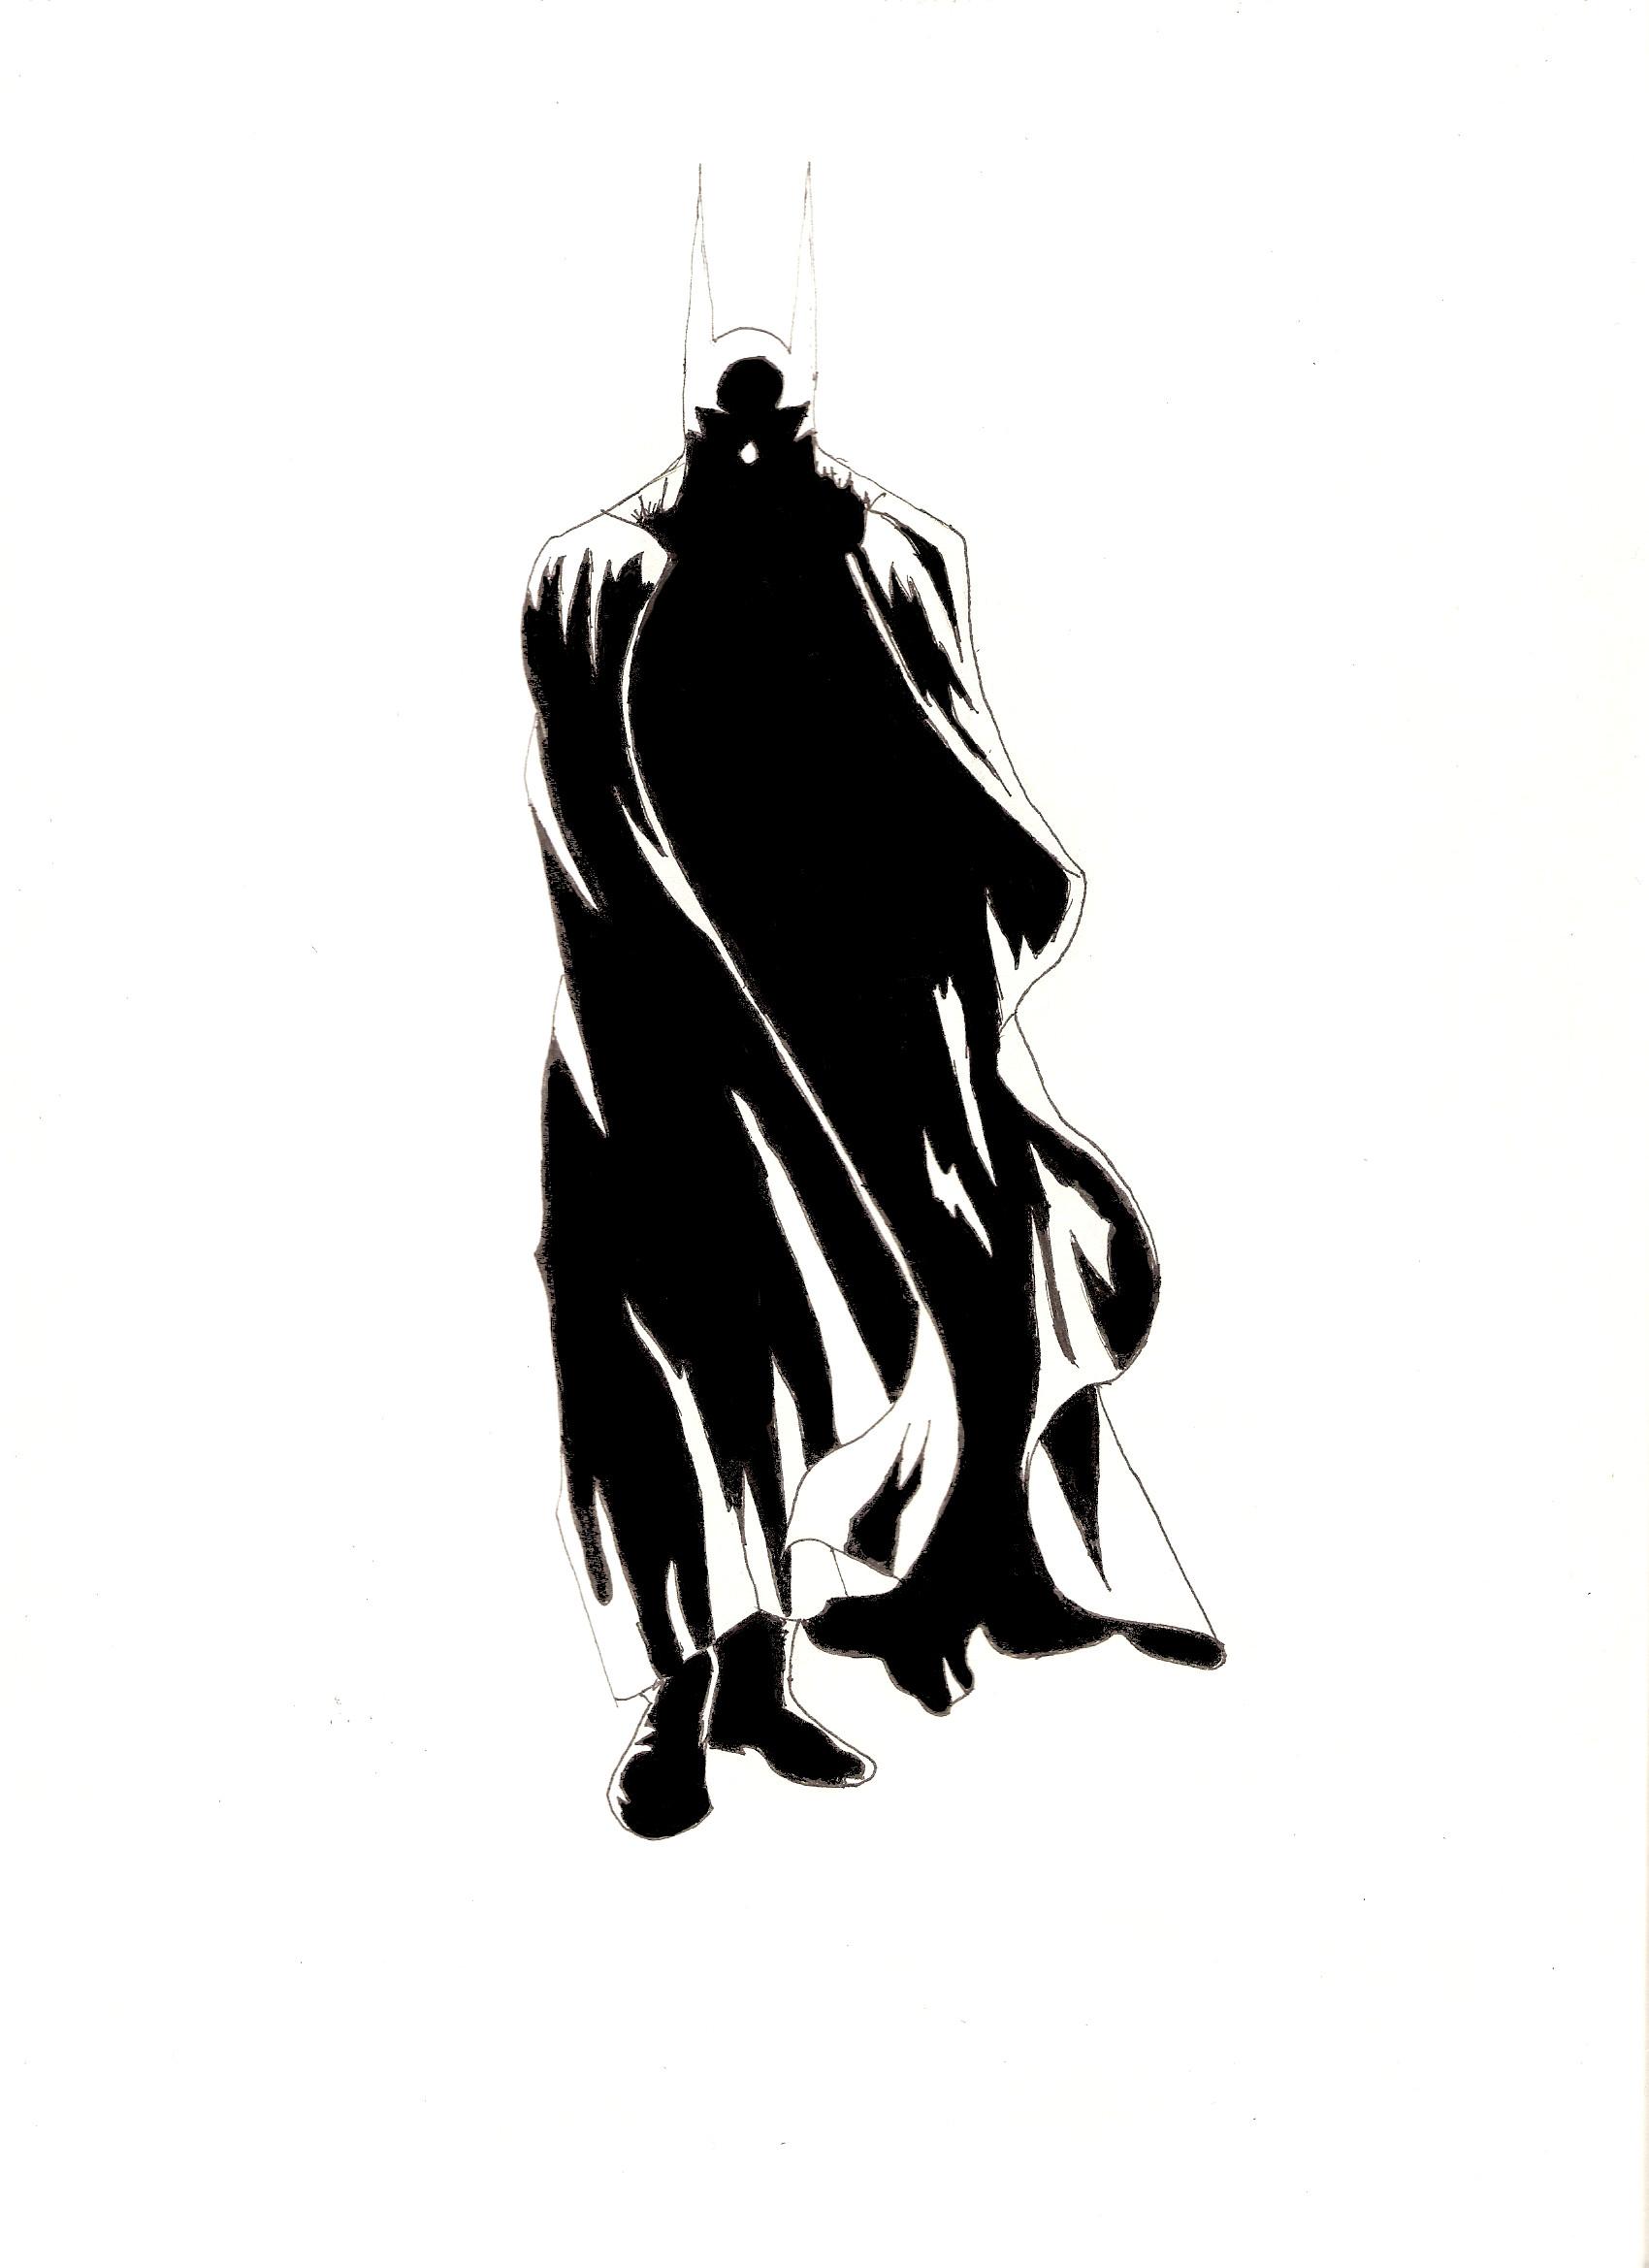 Crime Noir: Batman by Jukeboxhero01 on DeviantArt